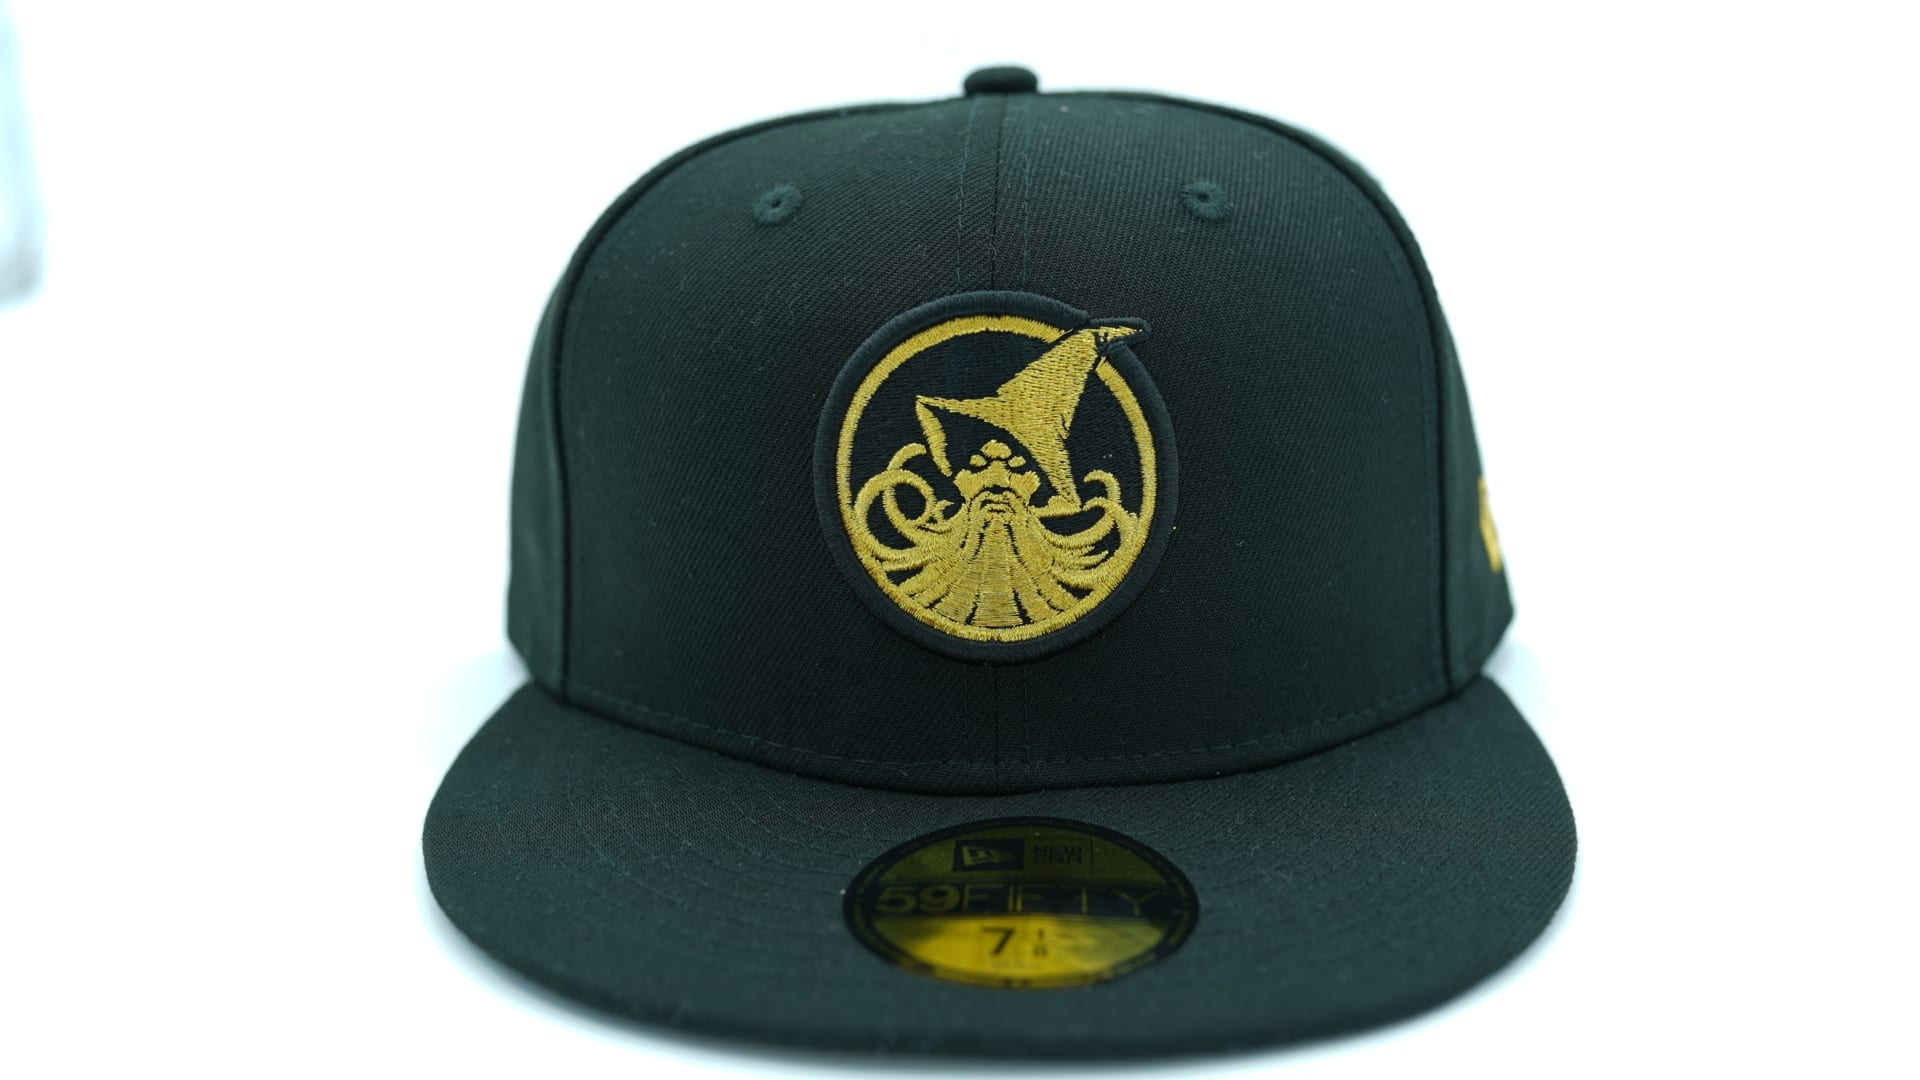 high crown baseball caps low hat dodgers black pop fitted cap era triple cape girardeau